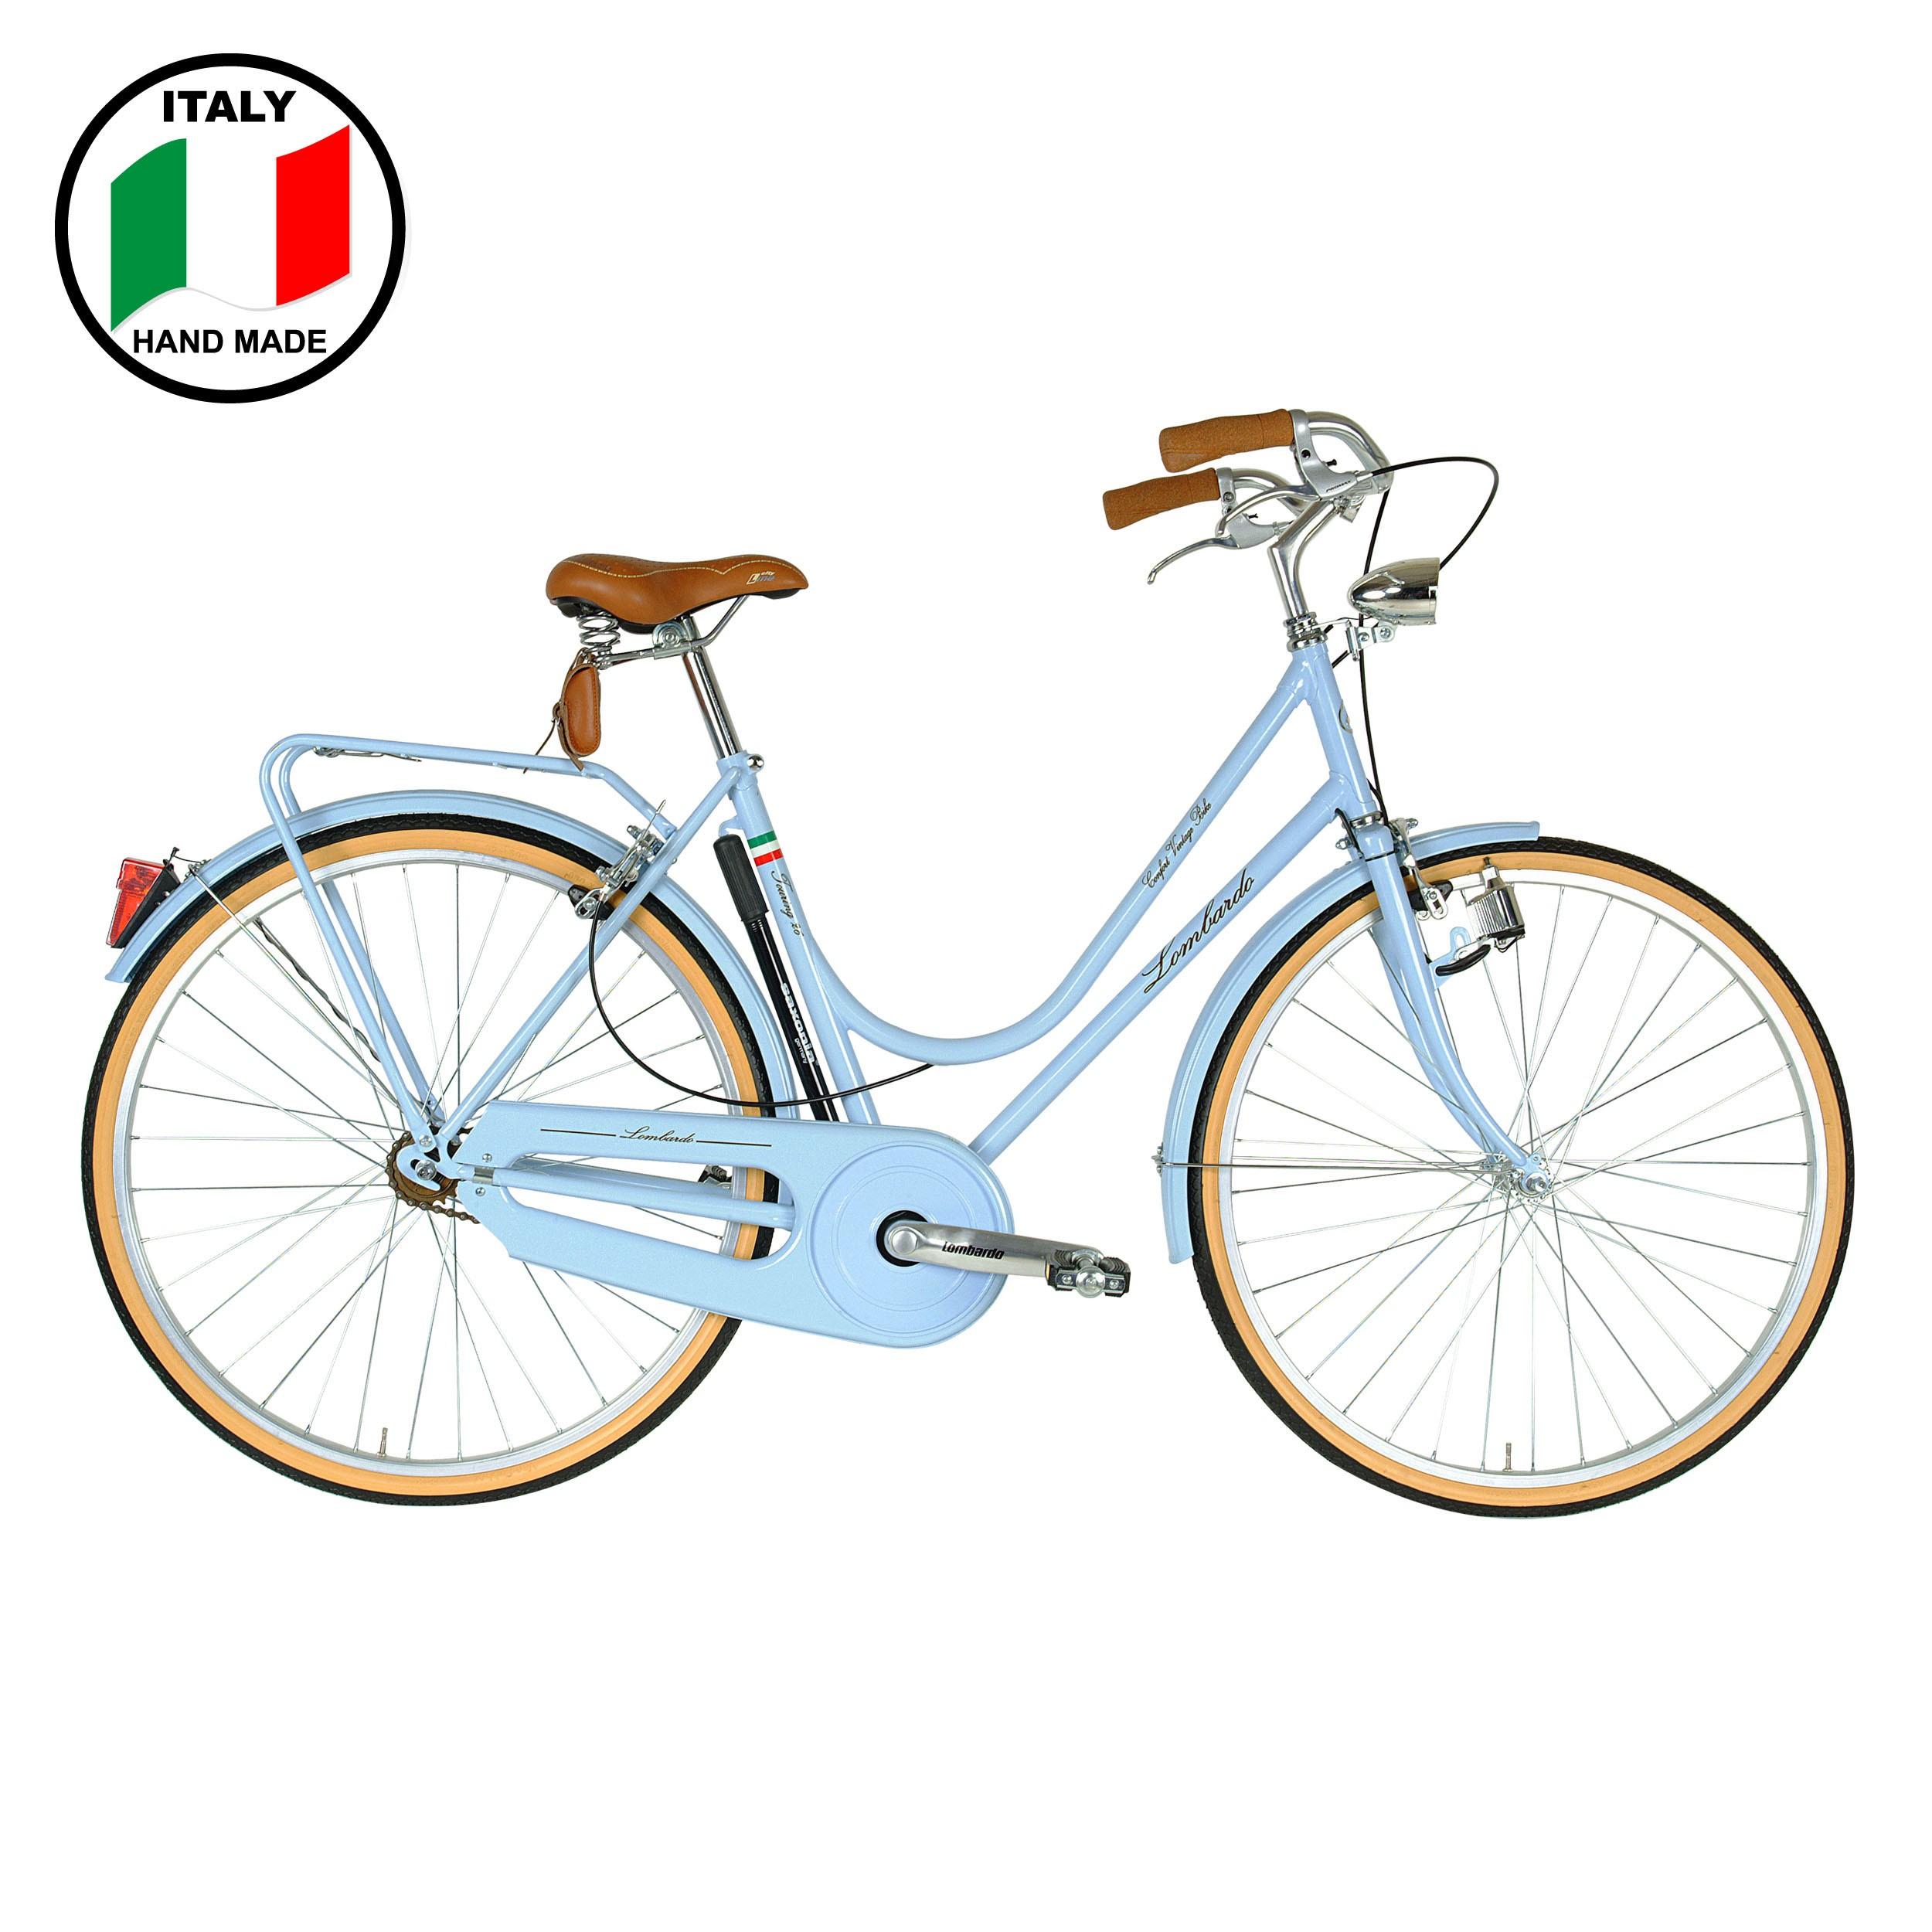 Lombardo Vintage Touring 28 inch Bike- Burgundy